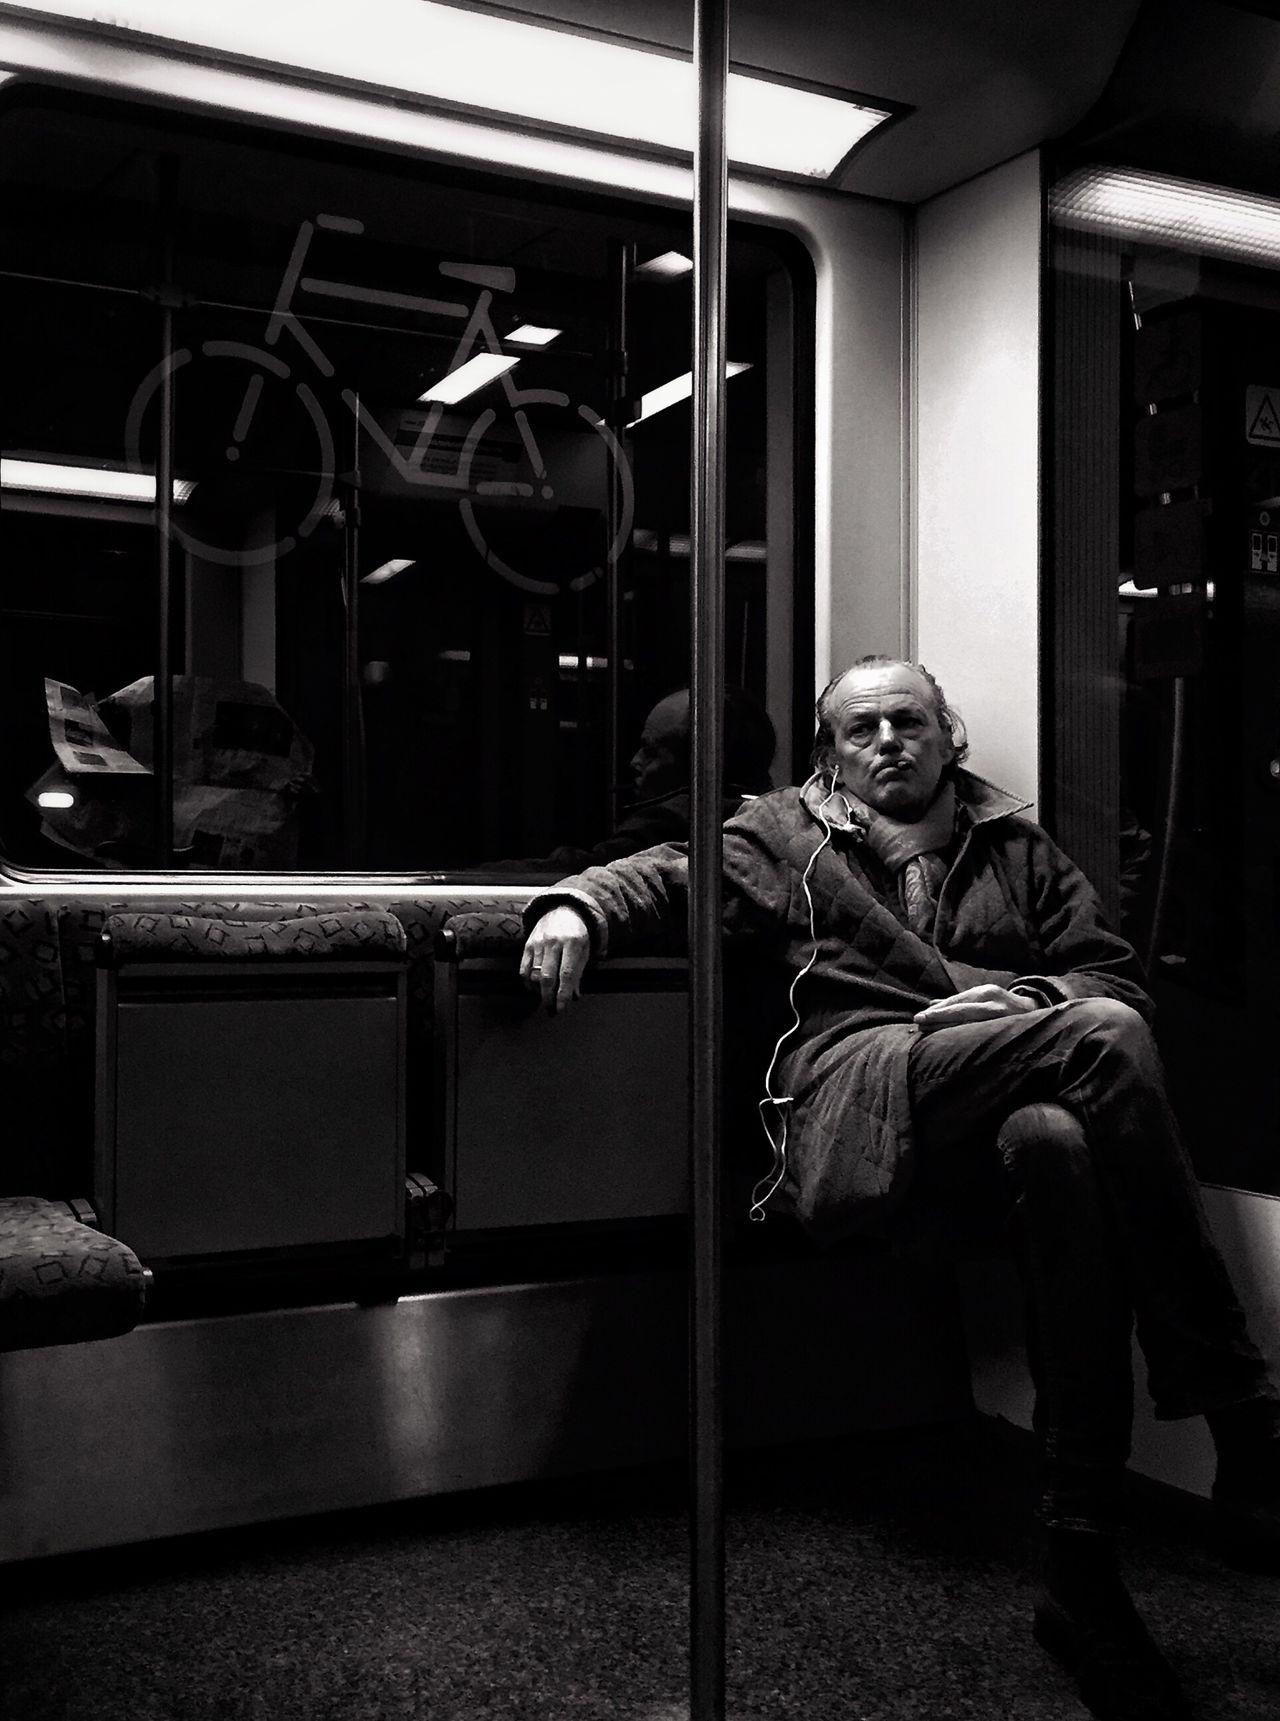 Jack Nicholson StreetPortraits Streetphotography Public Transportation Berlin Myfuckingberlin Blackandwhite Bnw Mpro Iphone6 Mobilephotography